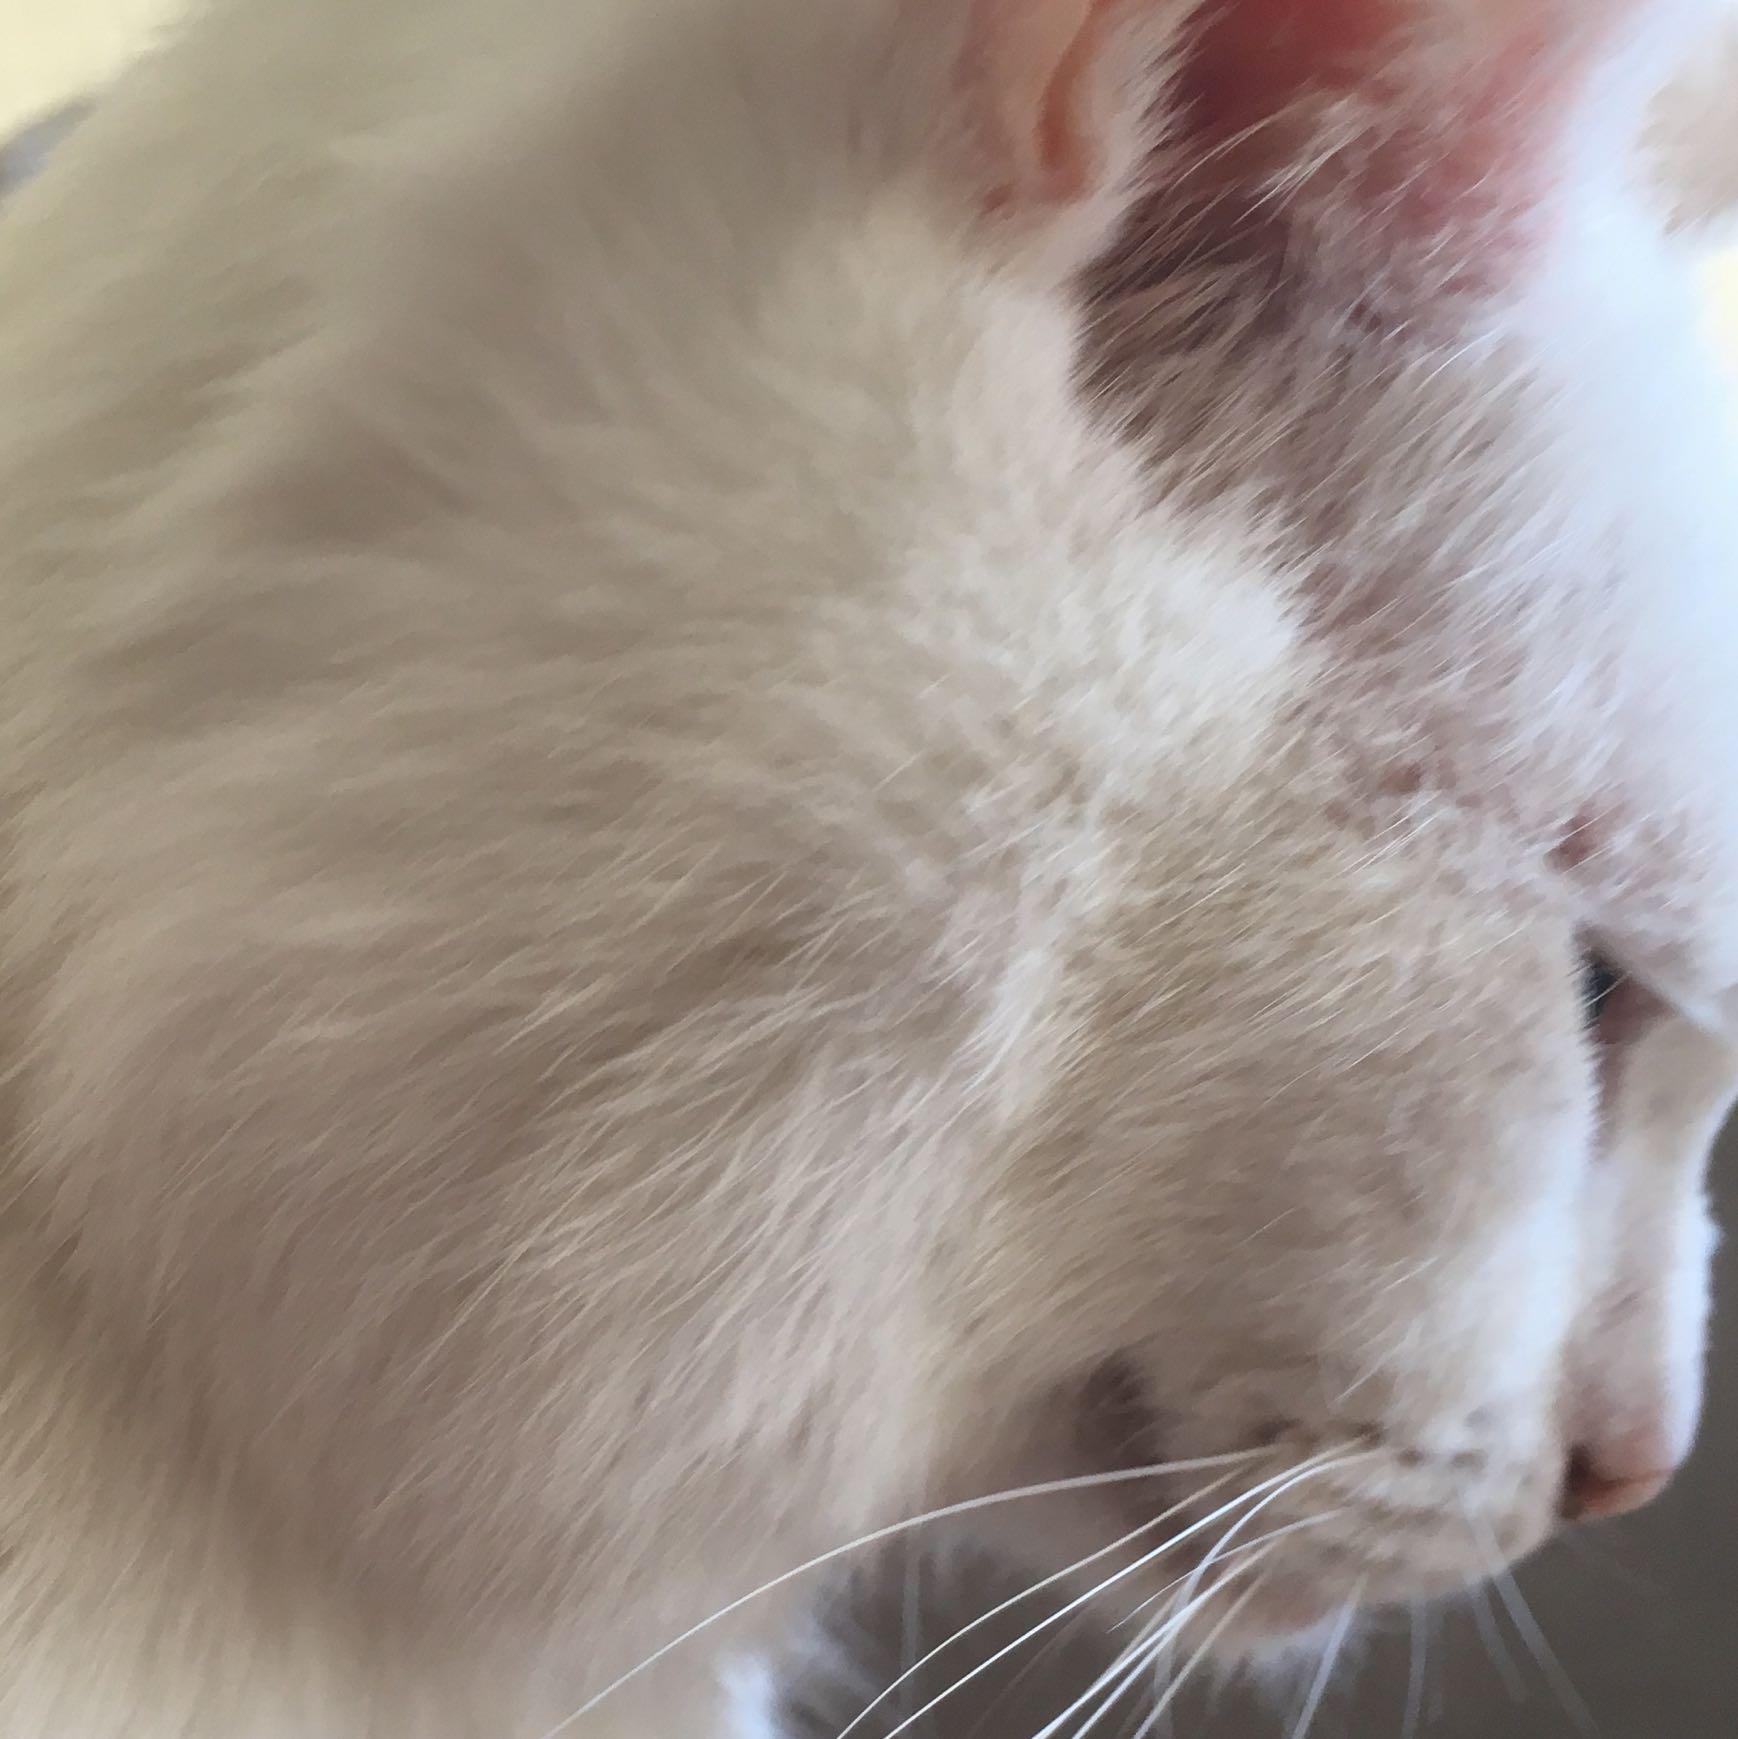 Katze Tumor Bauch